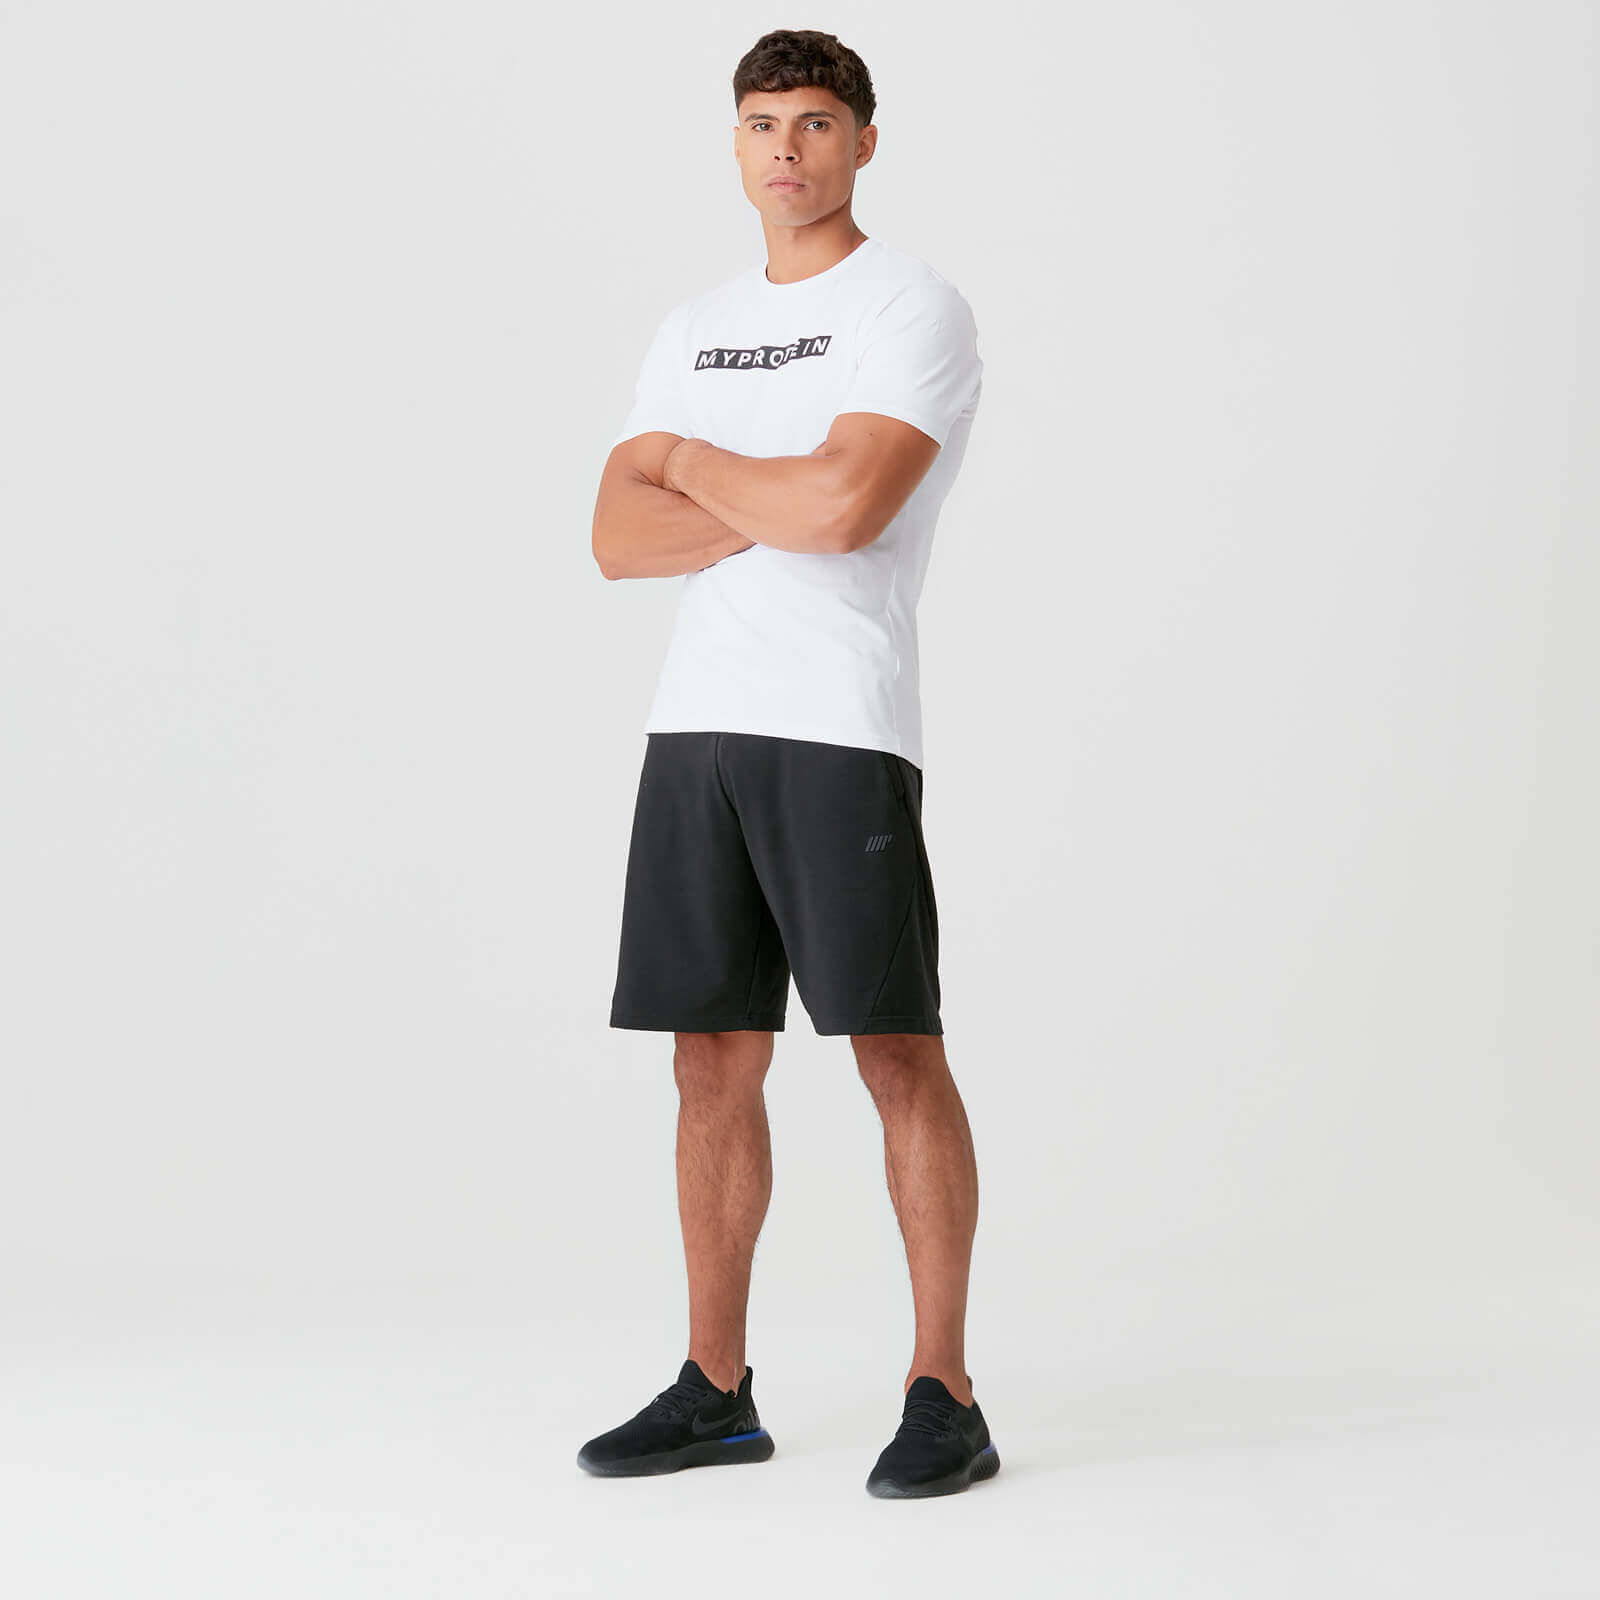 T-shirt Original - Blanc - XL